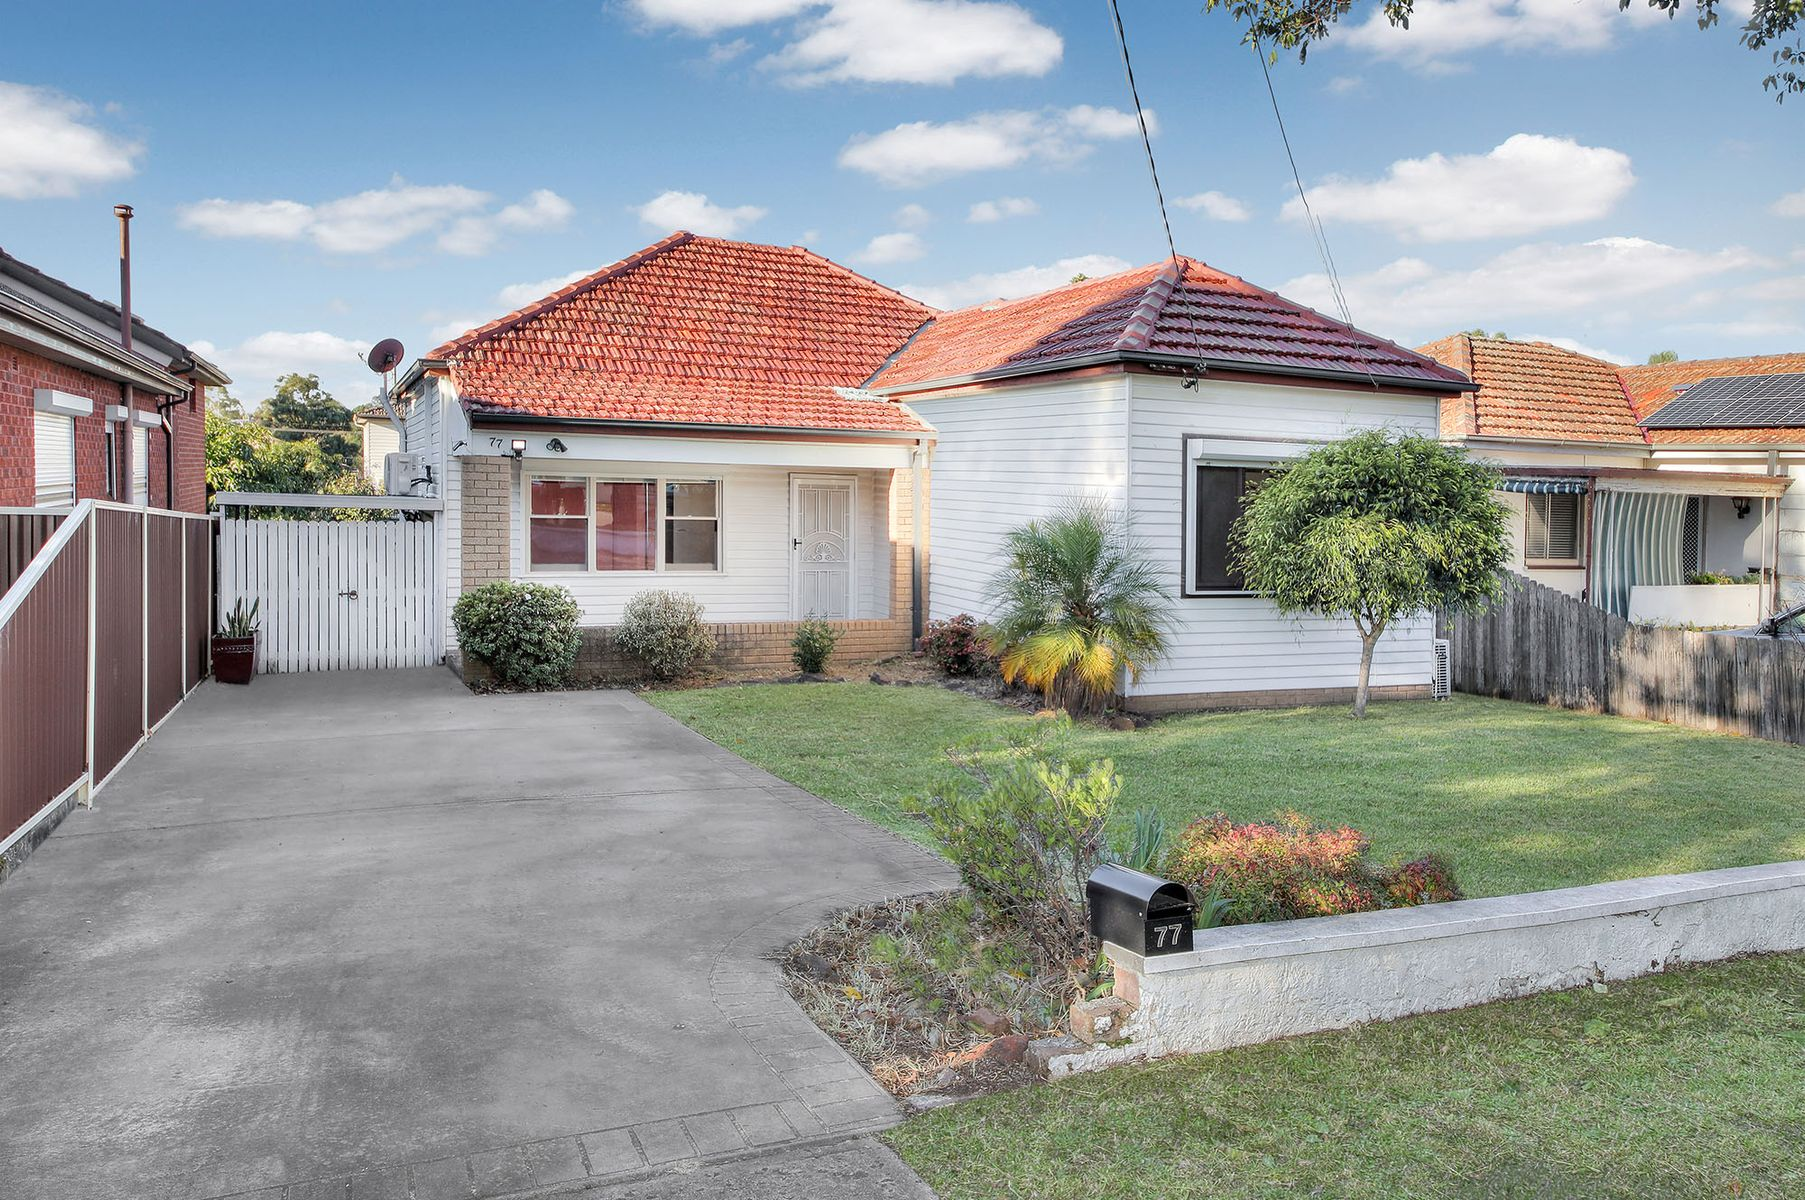 77 Mercury St, Narwee, NSW 2209